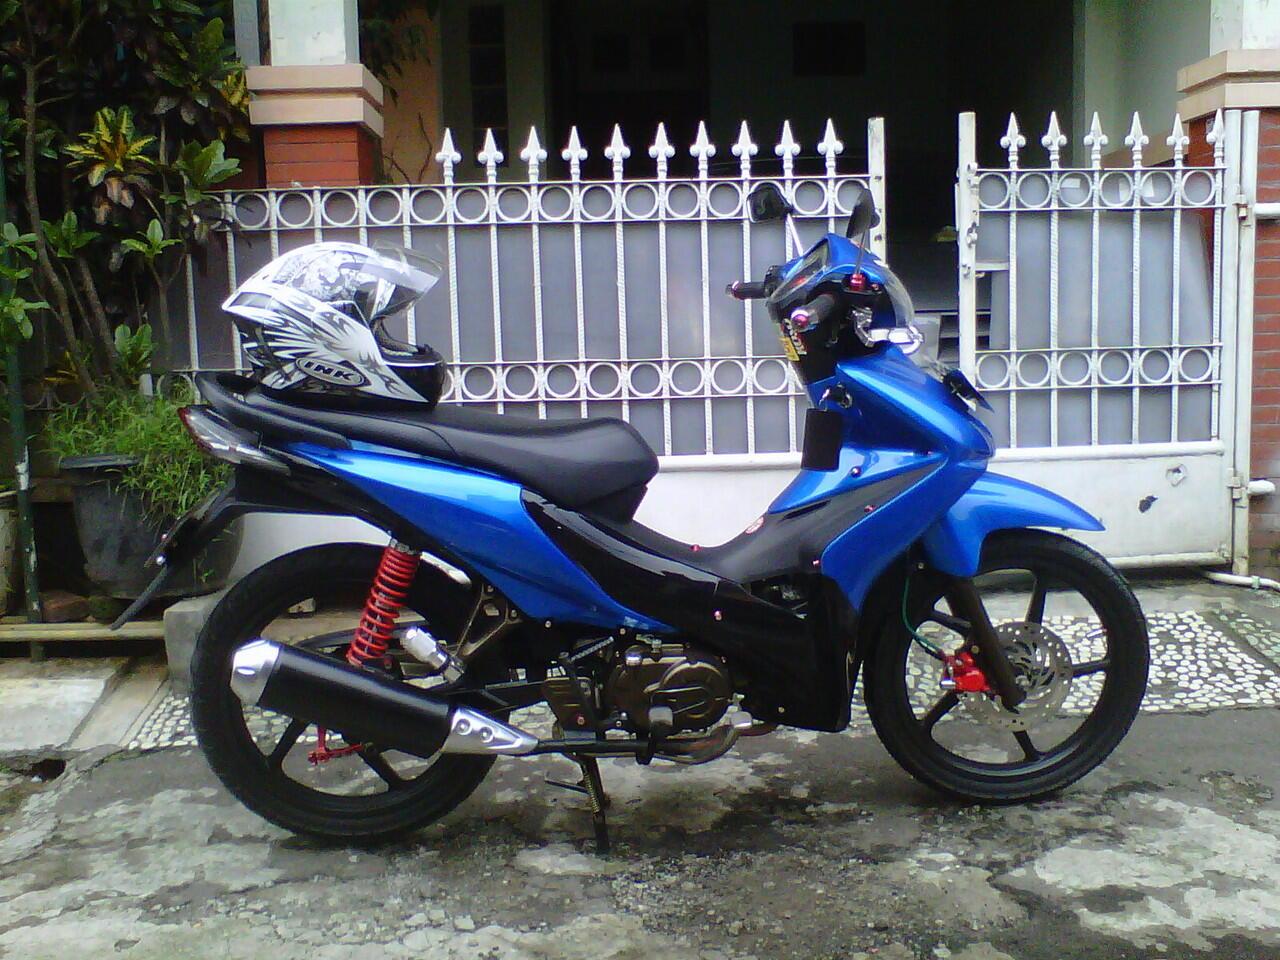 Cari Honda Absolute Revo DX 2009 Murah Meriah Modif Jual 2 Hari